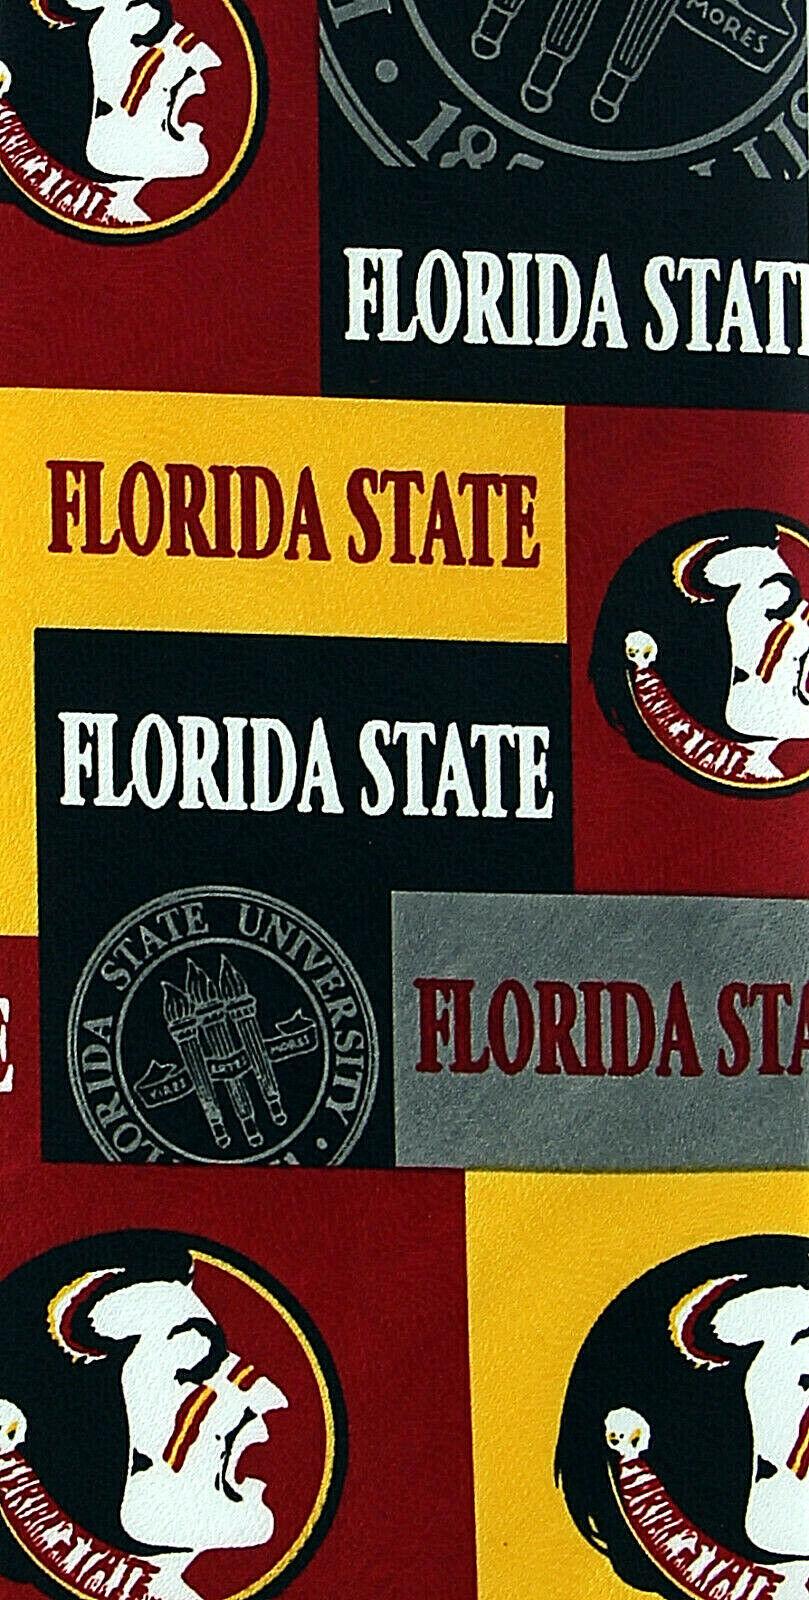 Florida State Seminoles Men's Licensed Necktie College University Red Neck Tie  image 2